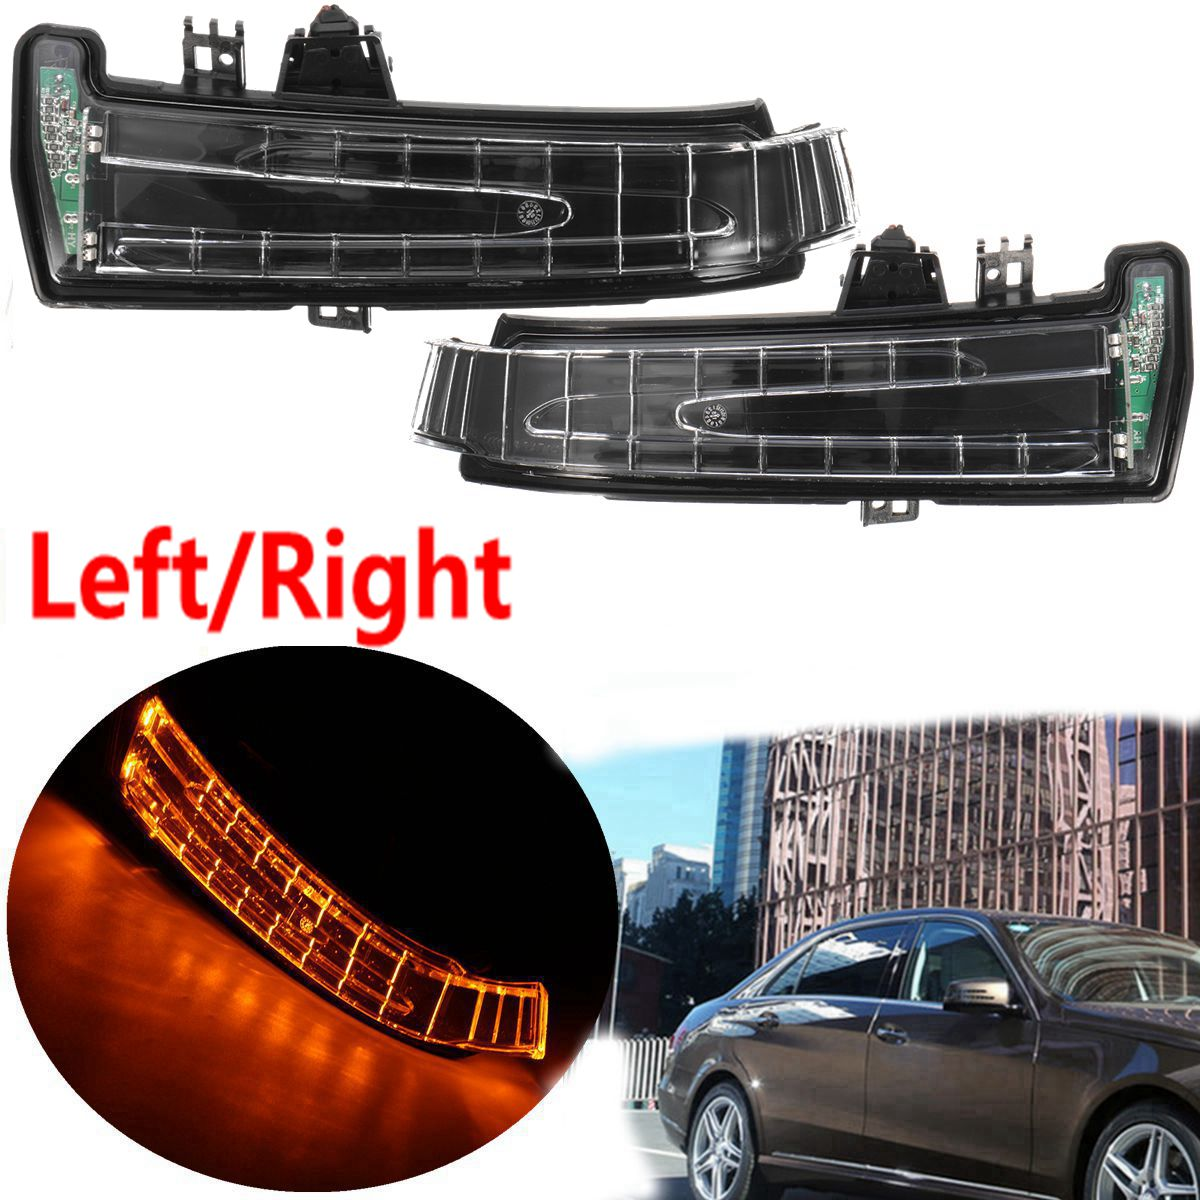 Pair Car Rear View Mirror Indicator Lamp Turn Signal Light Lens For Mercedes W204 W212 W221 2010-2013 цены